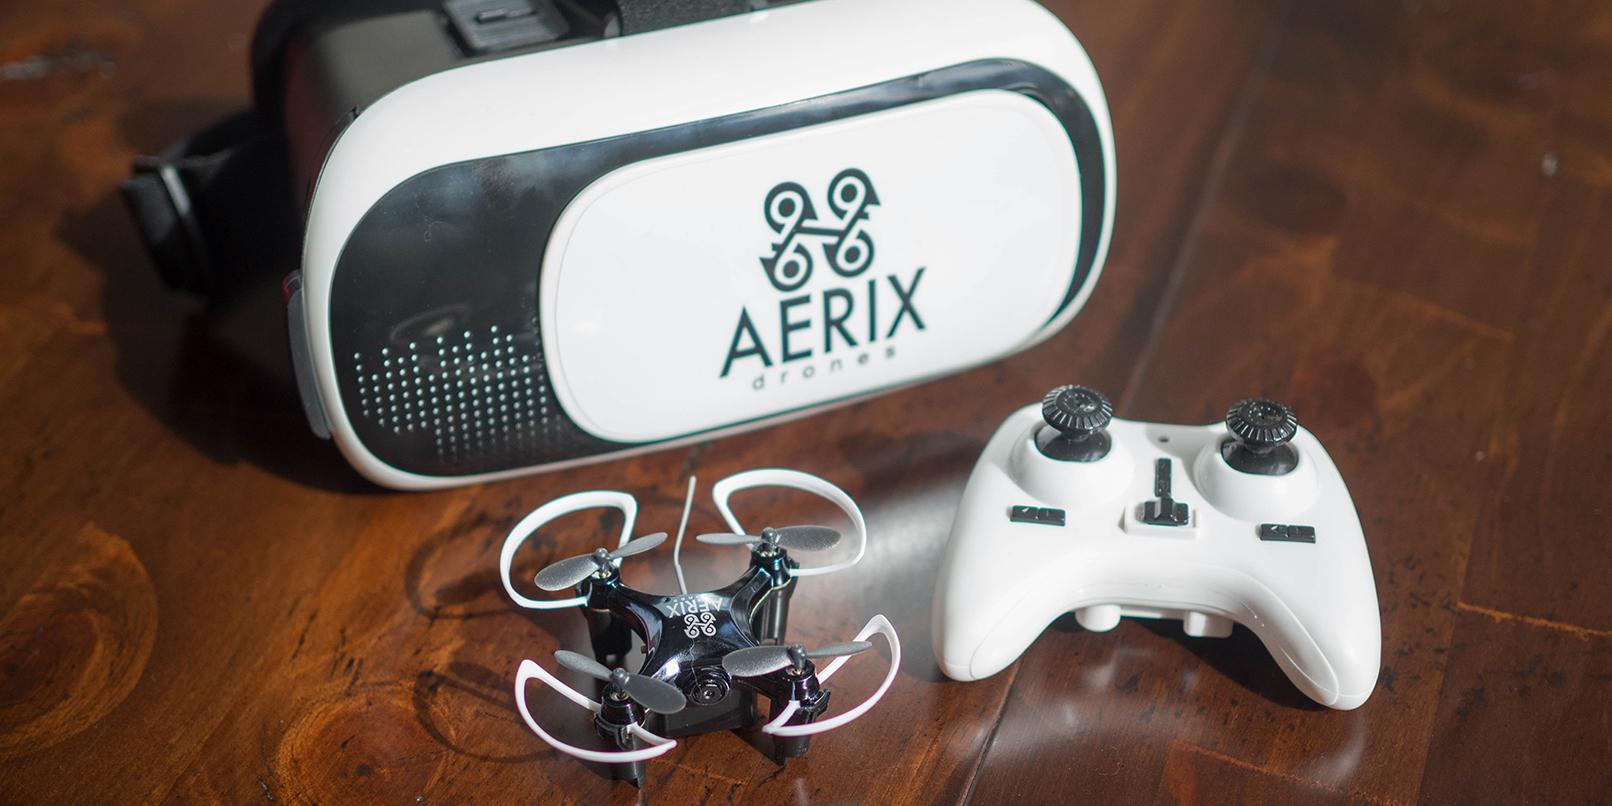 Review: Aerix's Vidius HD packs a lot of fun into a tiny drone